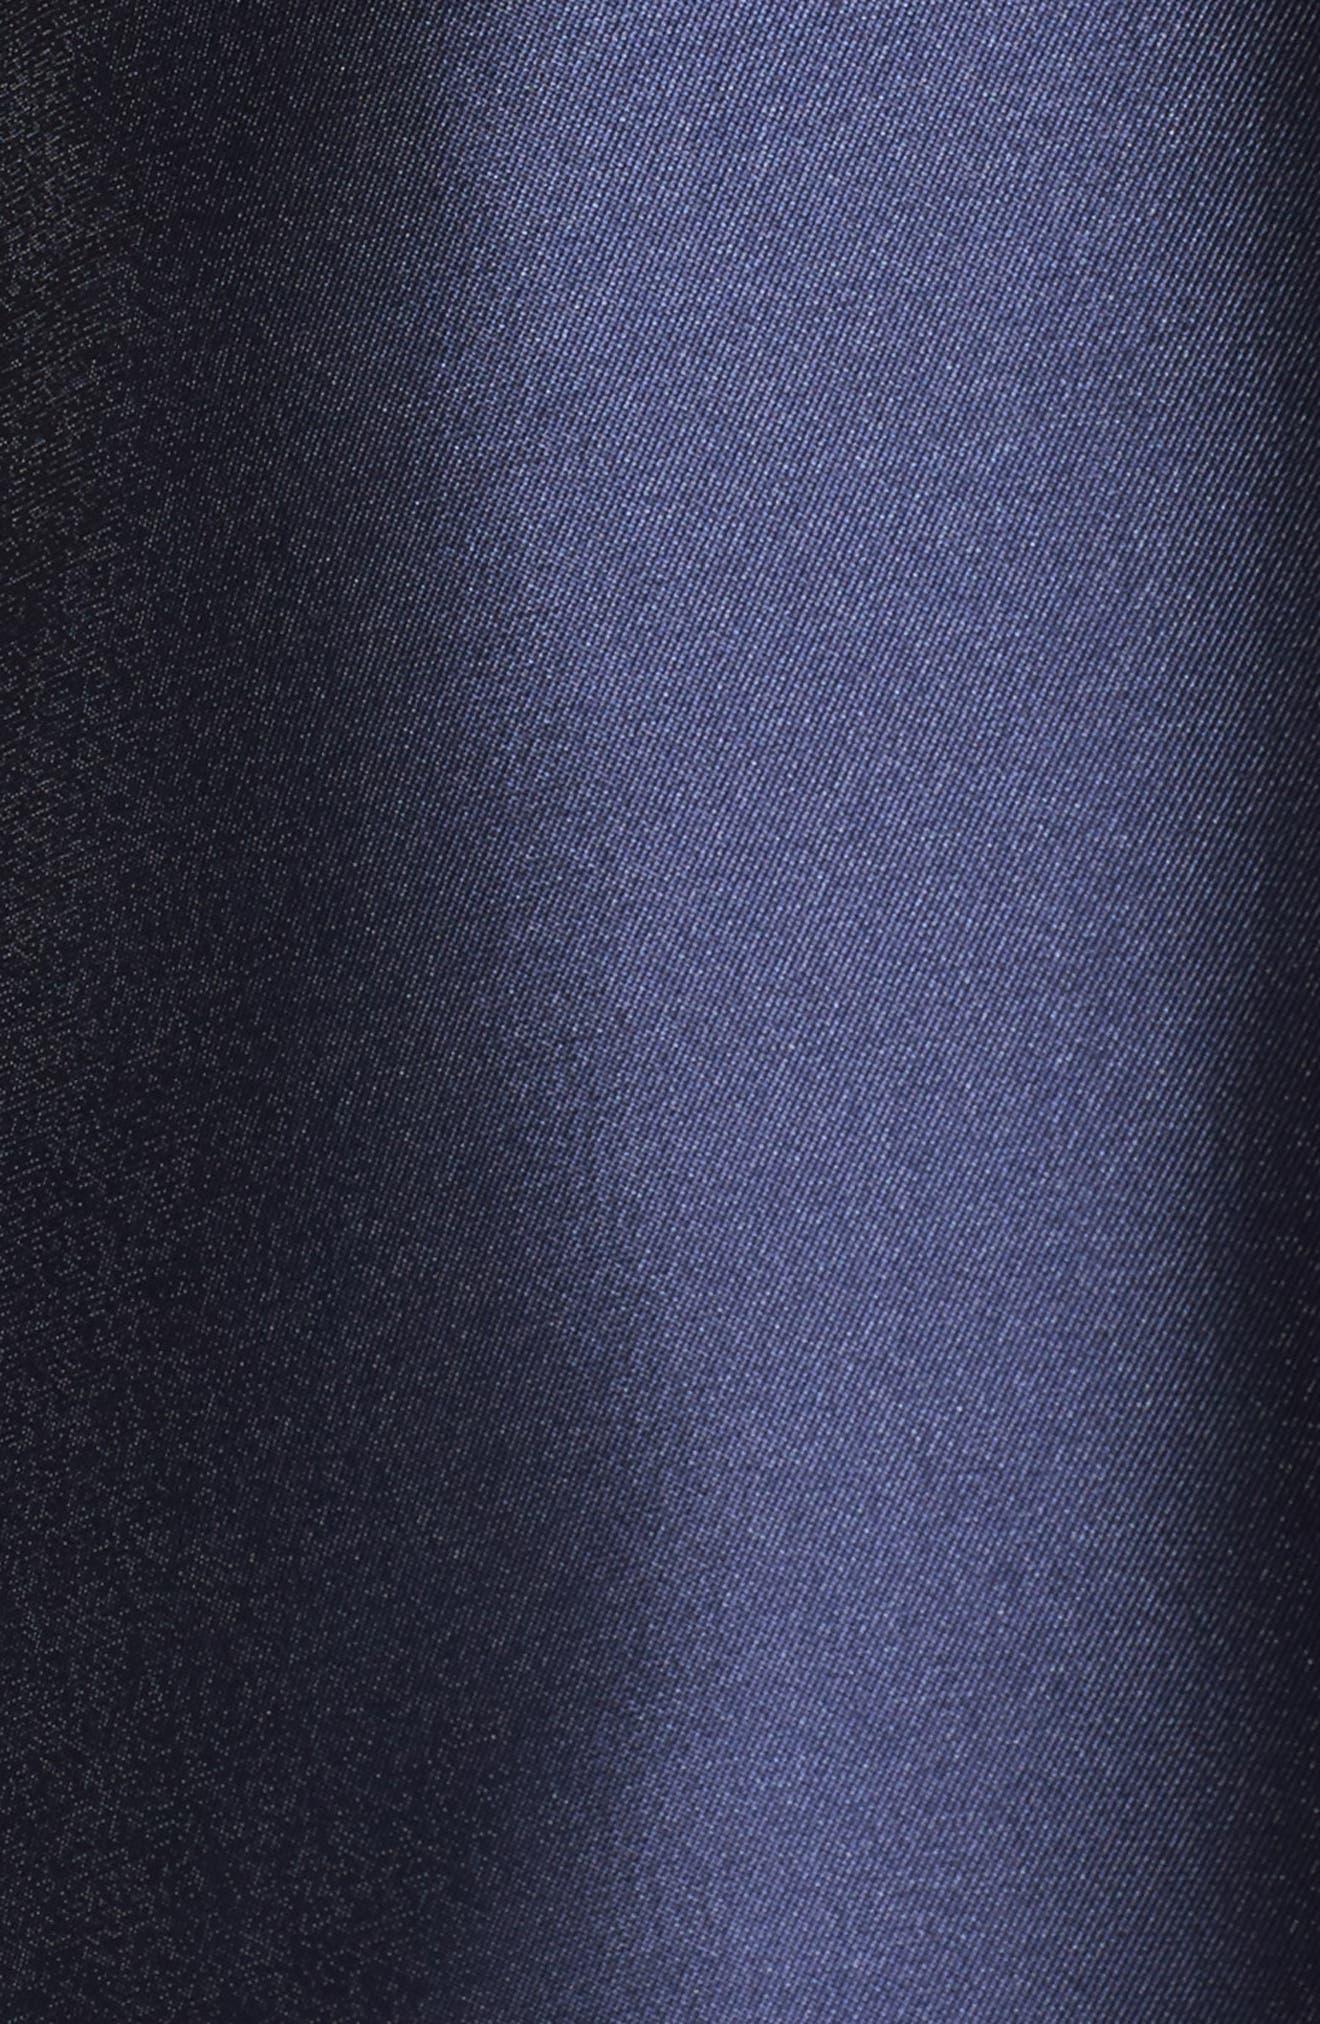 Halter Fit & Flare Dress,                             Alternate thumbnail 5, color,                             410